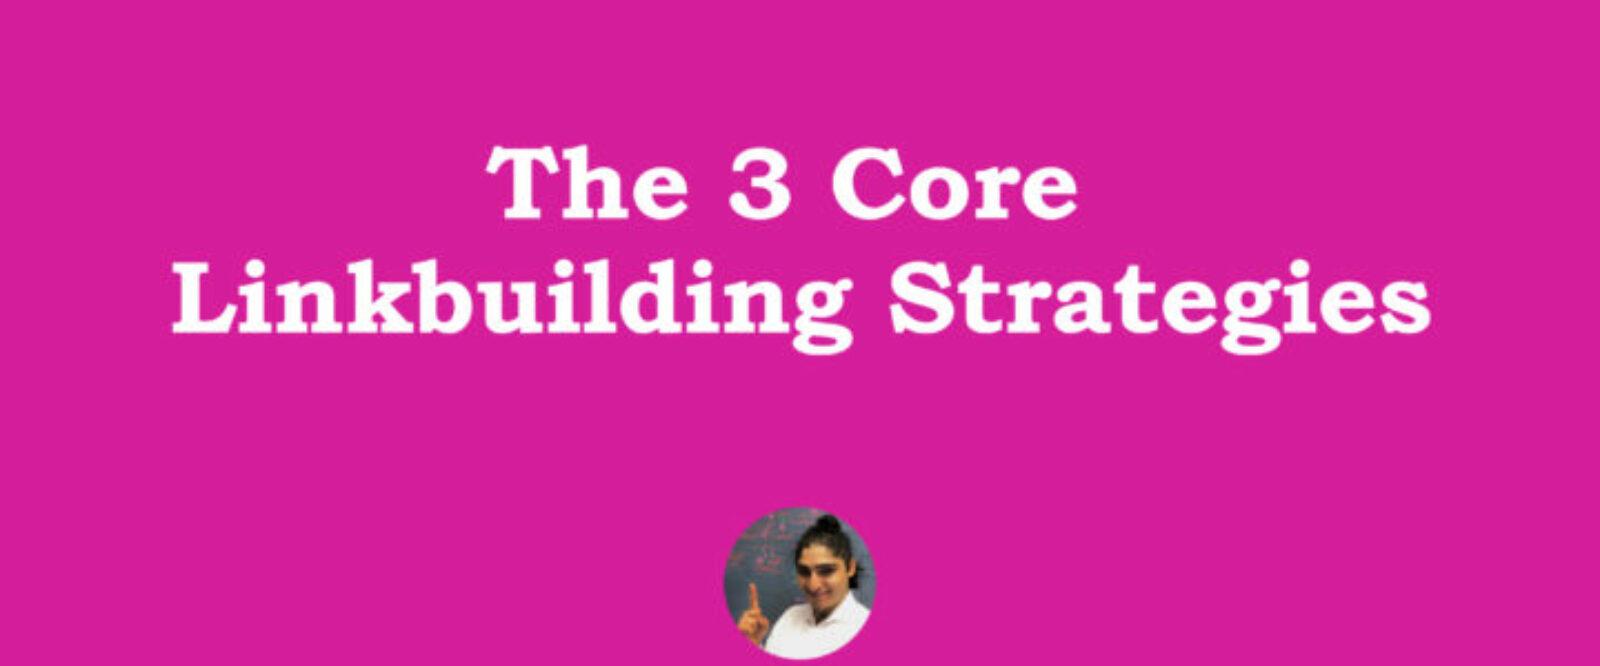 3 Core Link Building Strategies